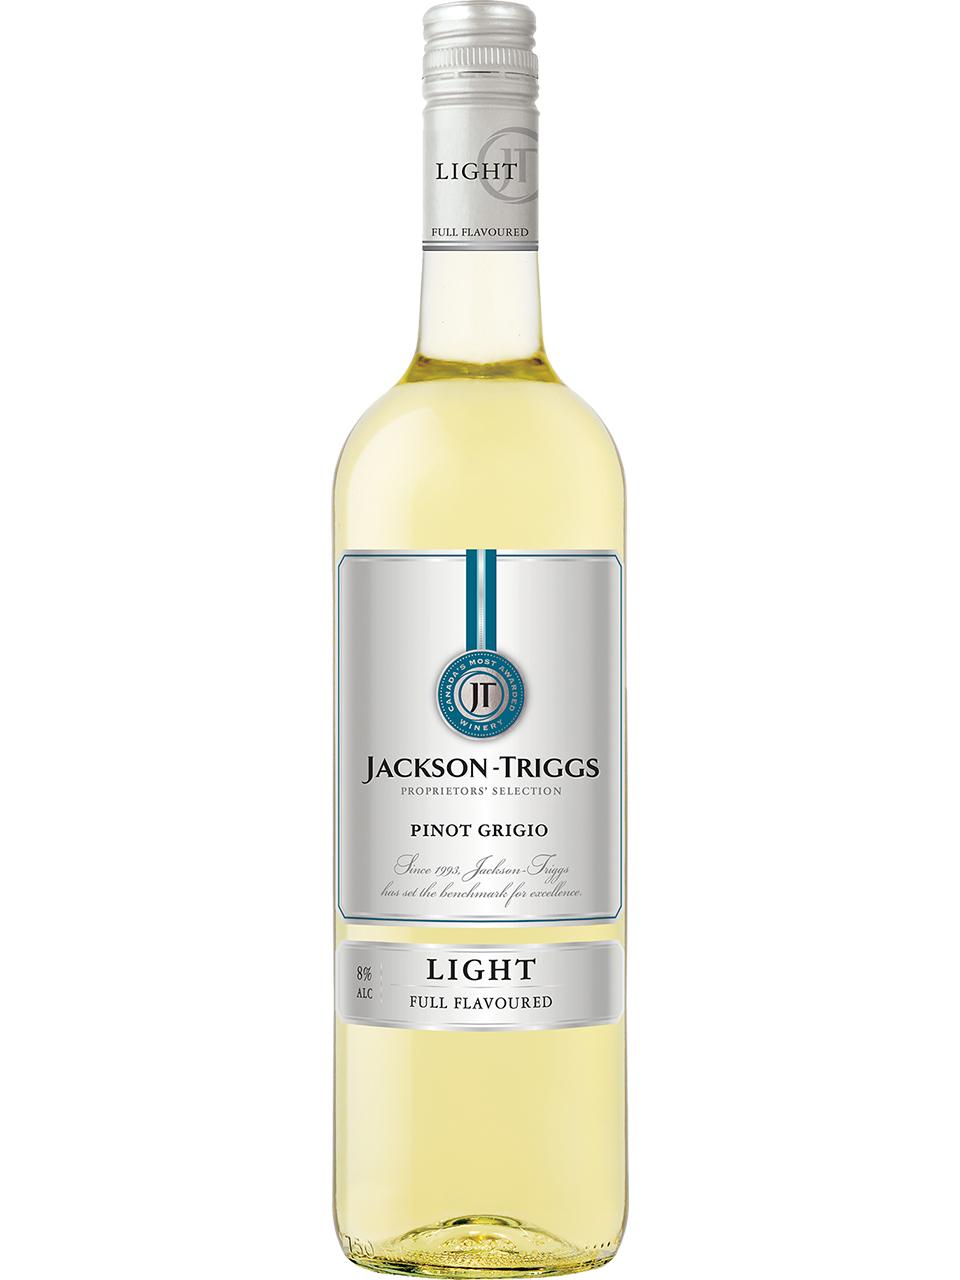 Jackson Triggs Proprietors' Sel Light Pinot Grigio